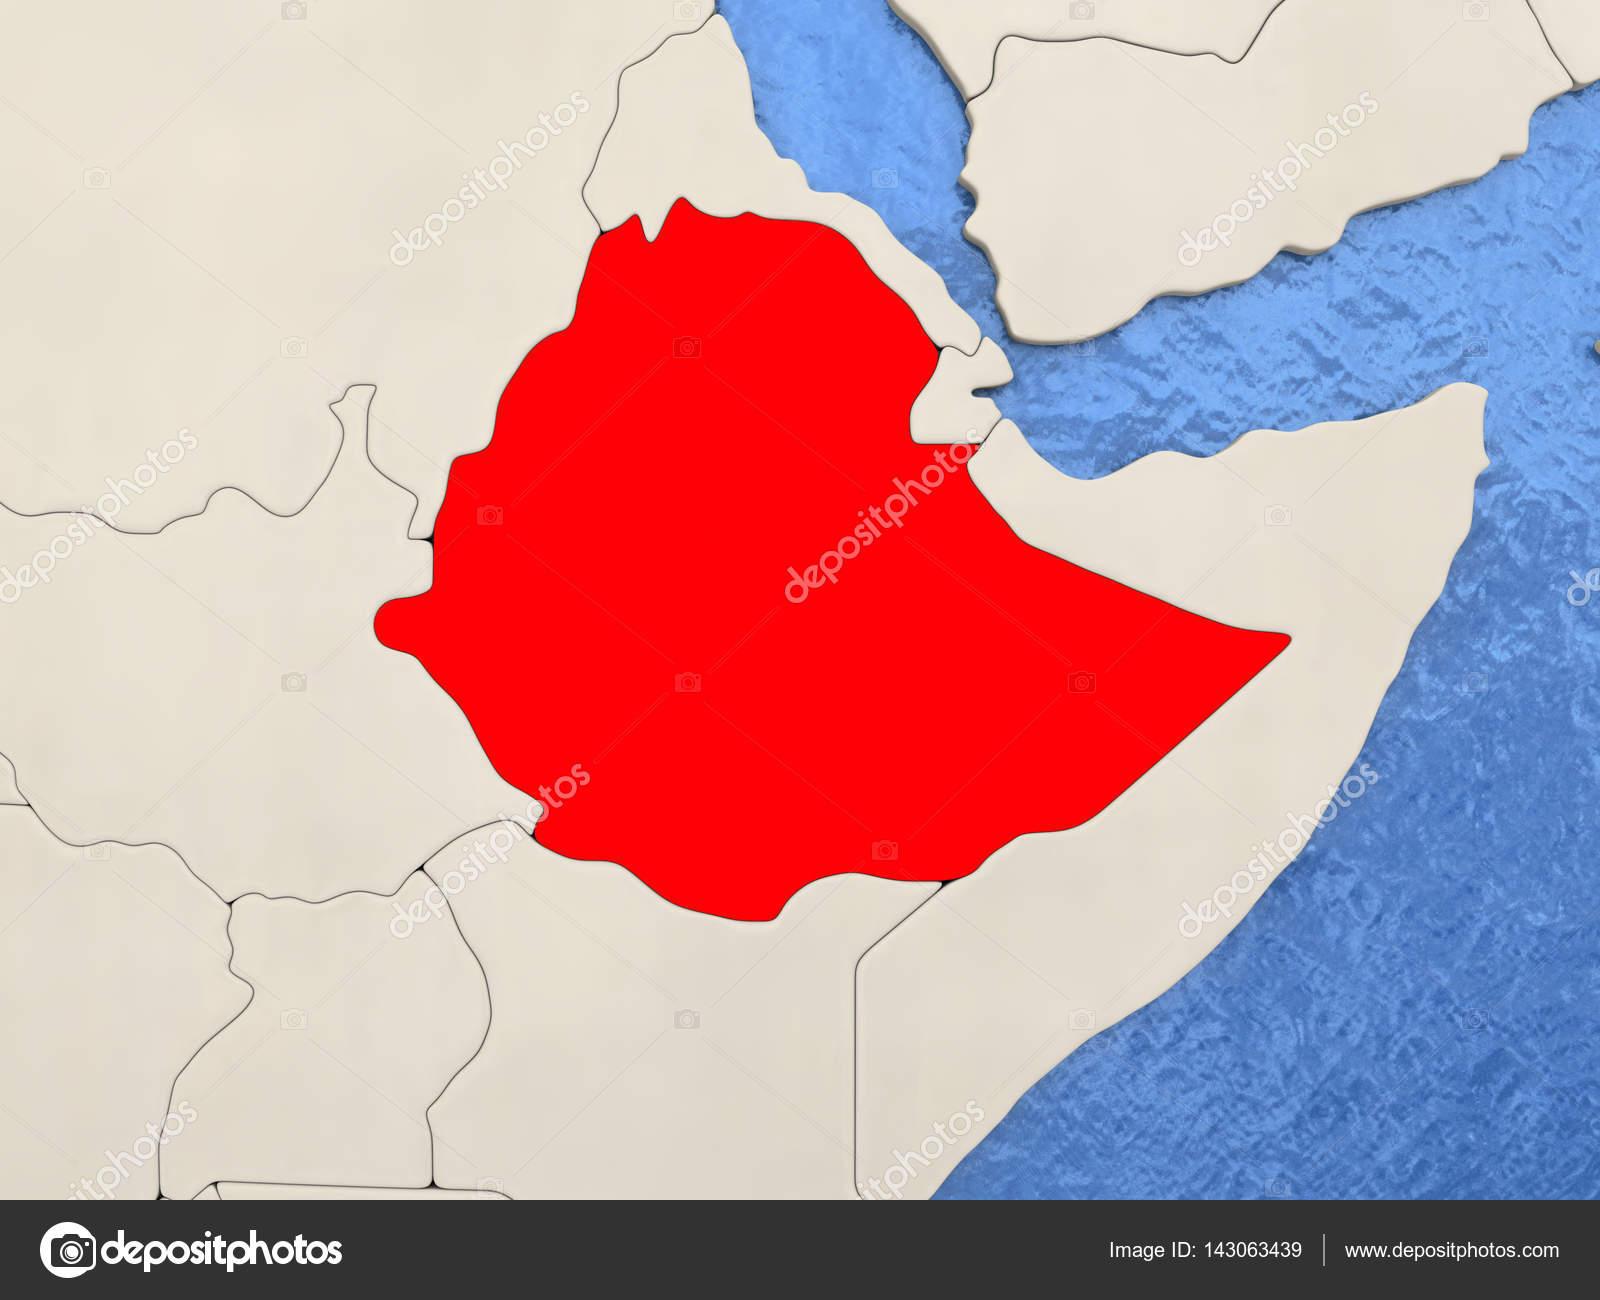 Ethiopia on map — Stock Photo © tom.griger #143063439